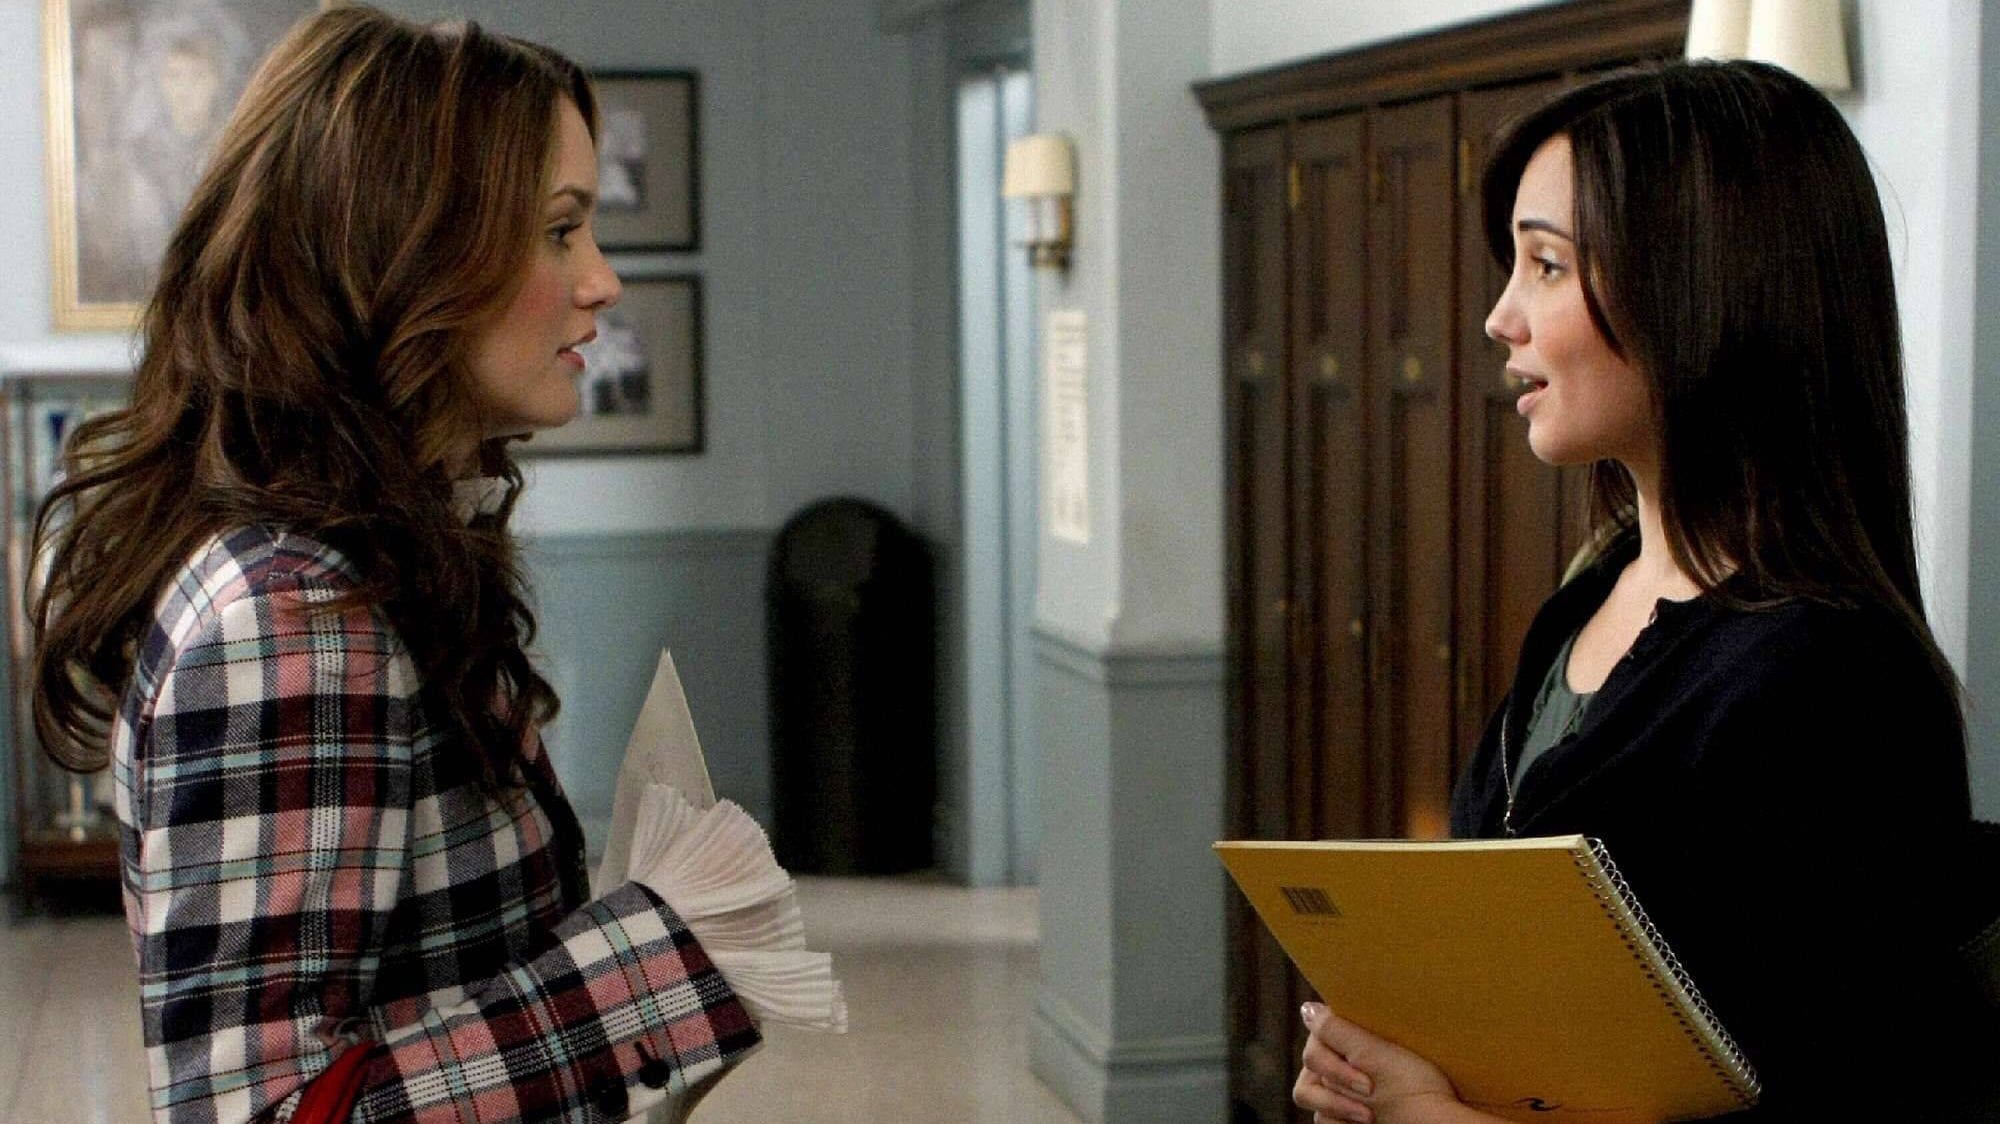 Watch Gossip Girl Season 2 Online for Free on 123Movie